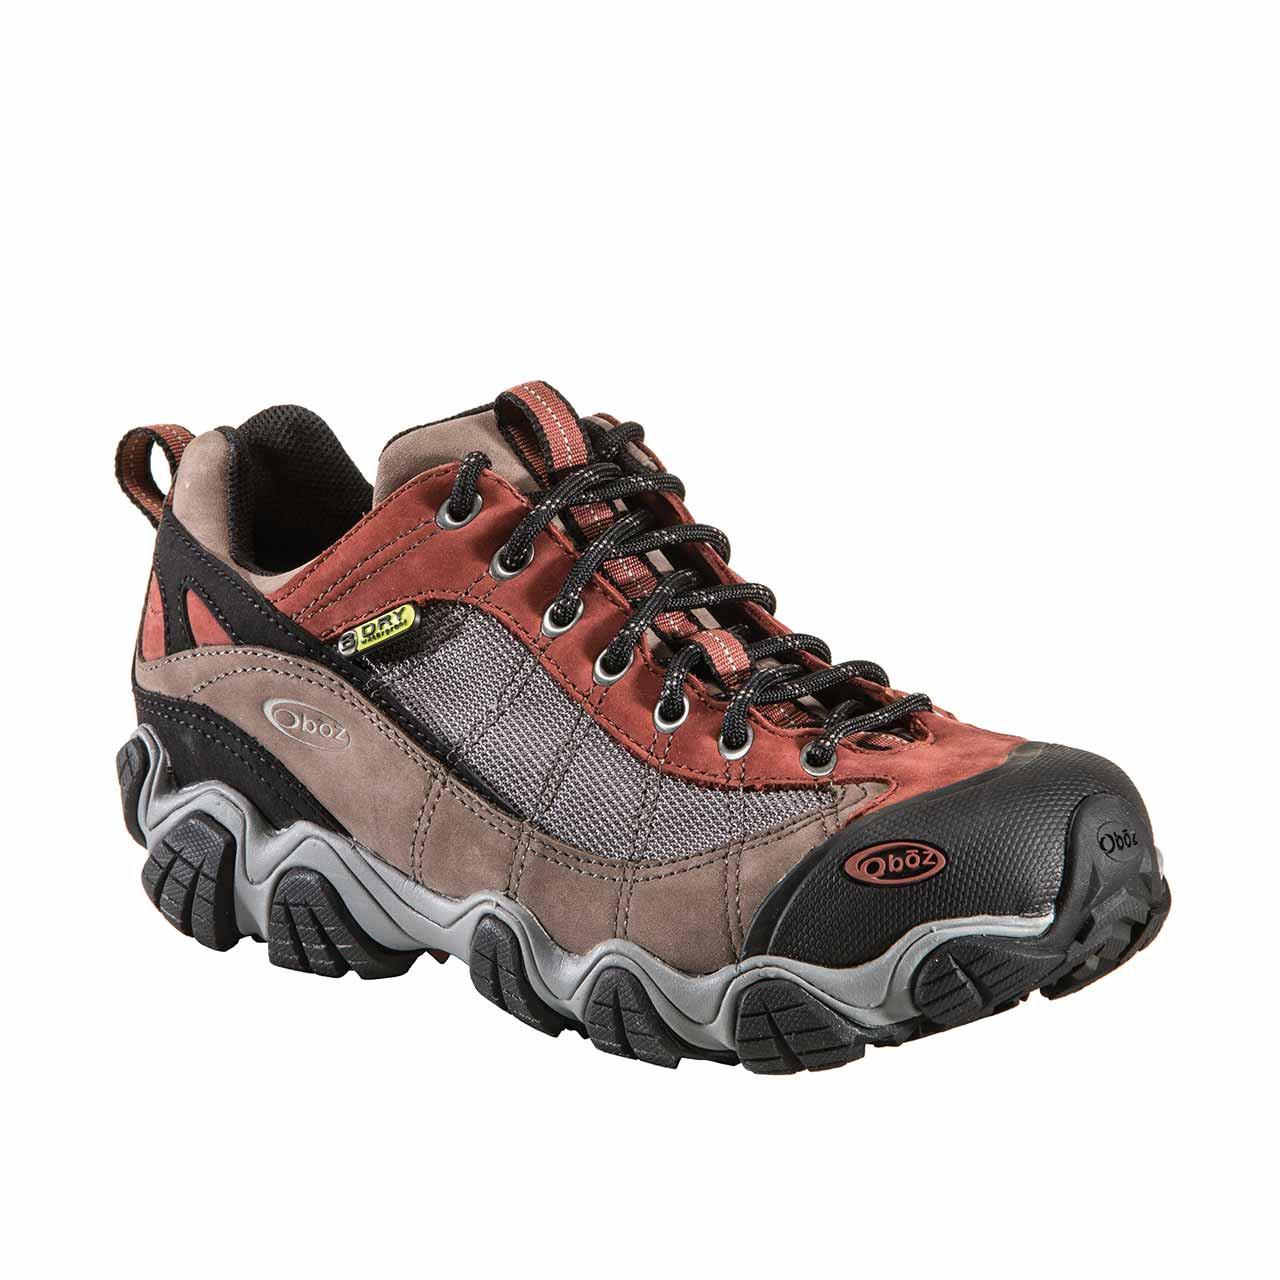 b73ddb0916f Oboz Men's Firebrand II Low BDry Hiking Shoe